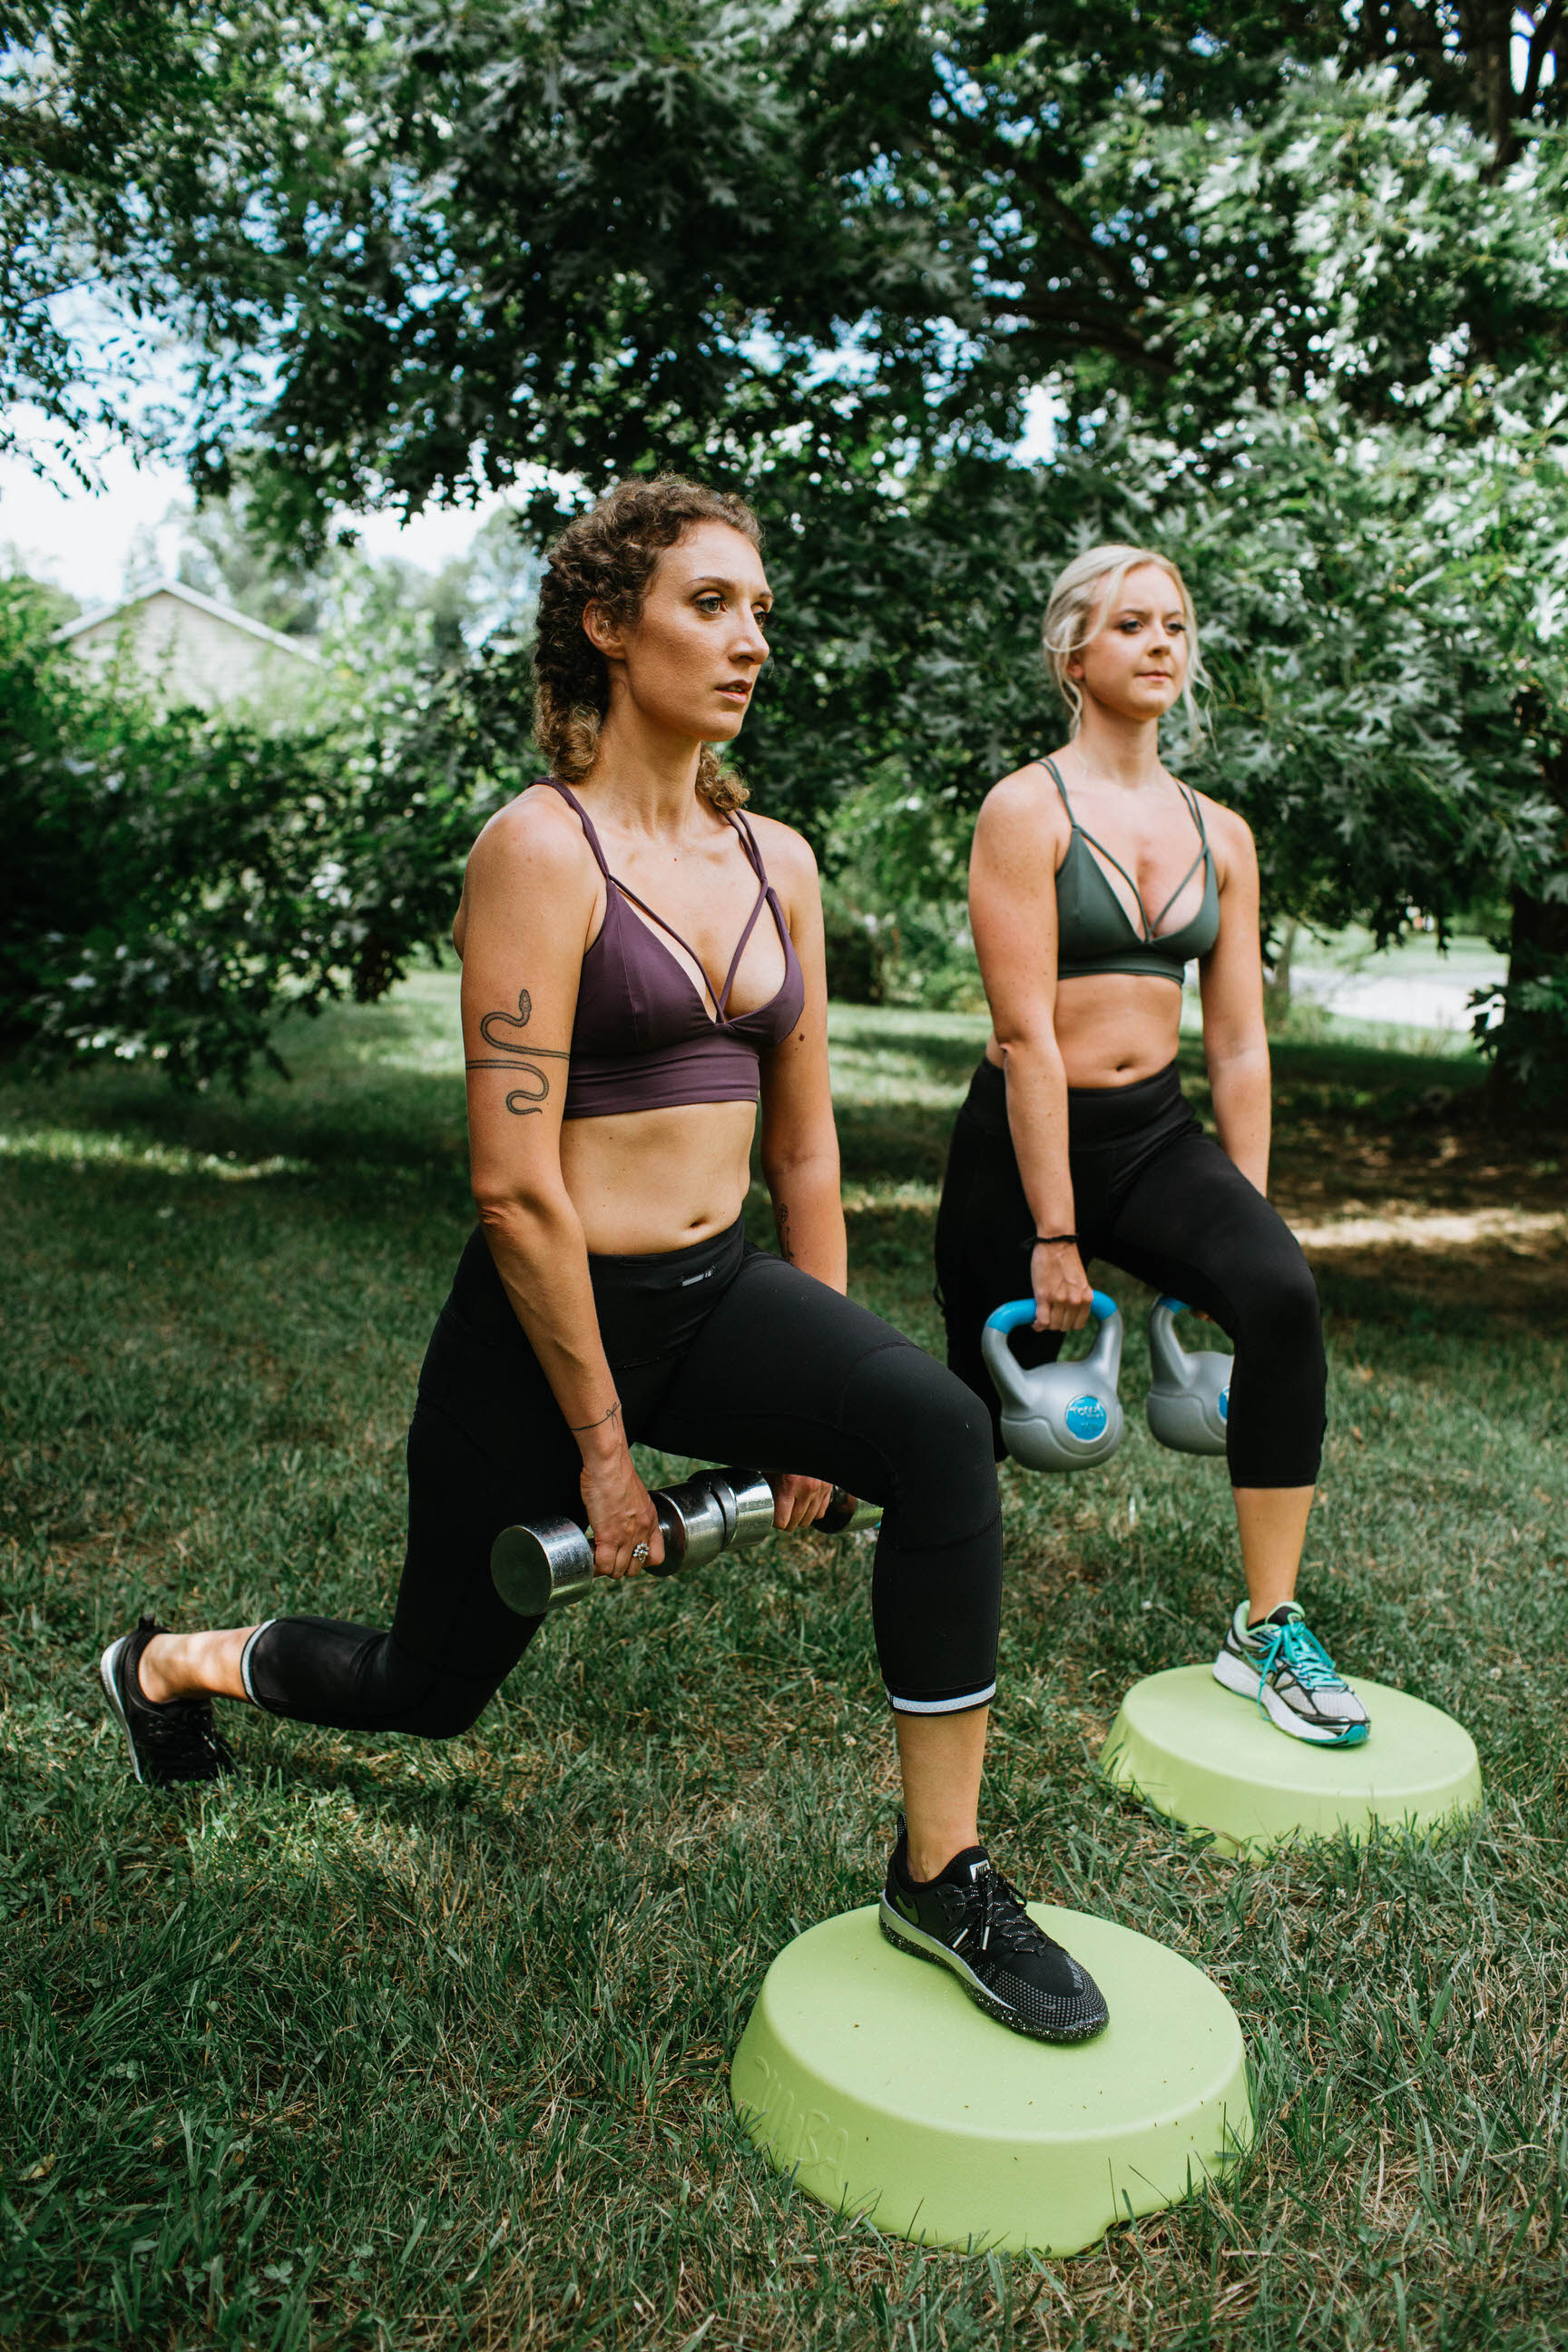 fitness-photoshoot-8053.jpg